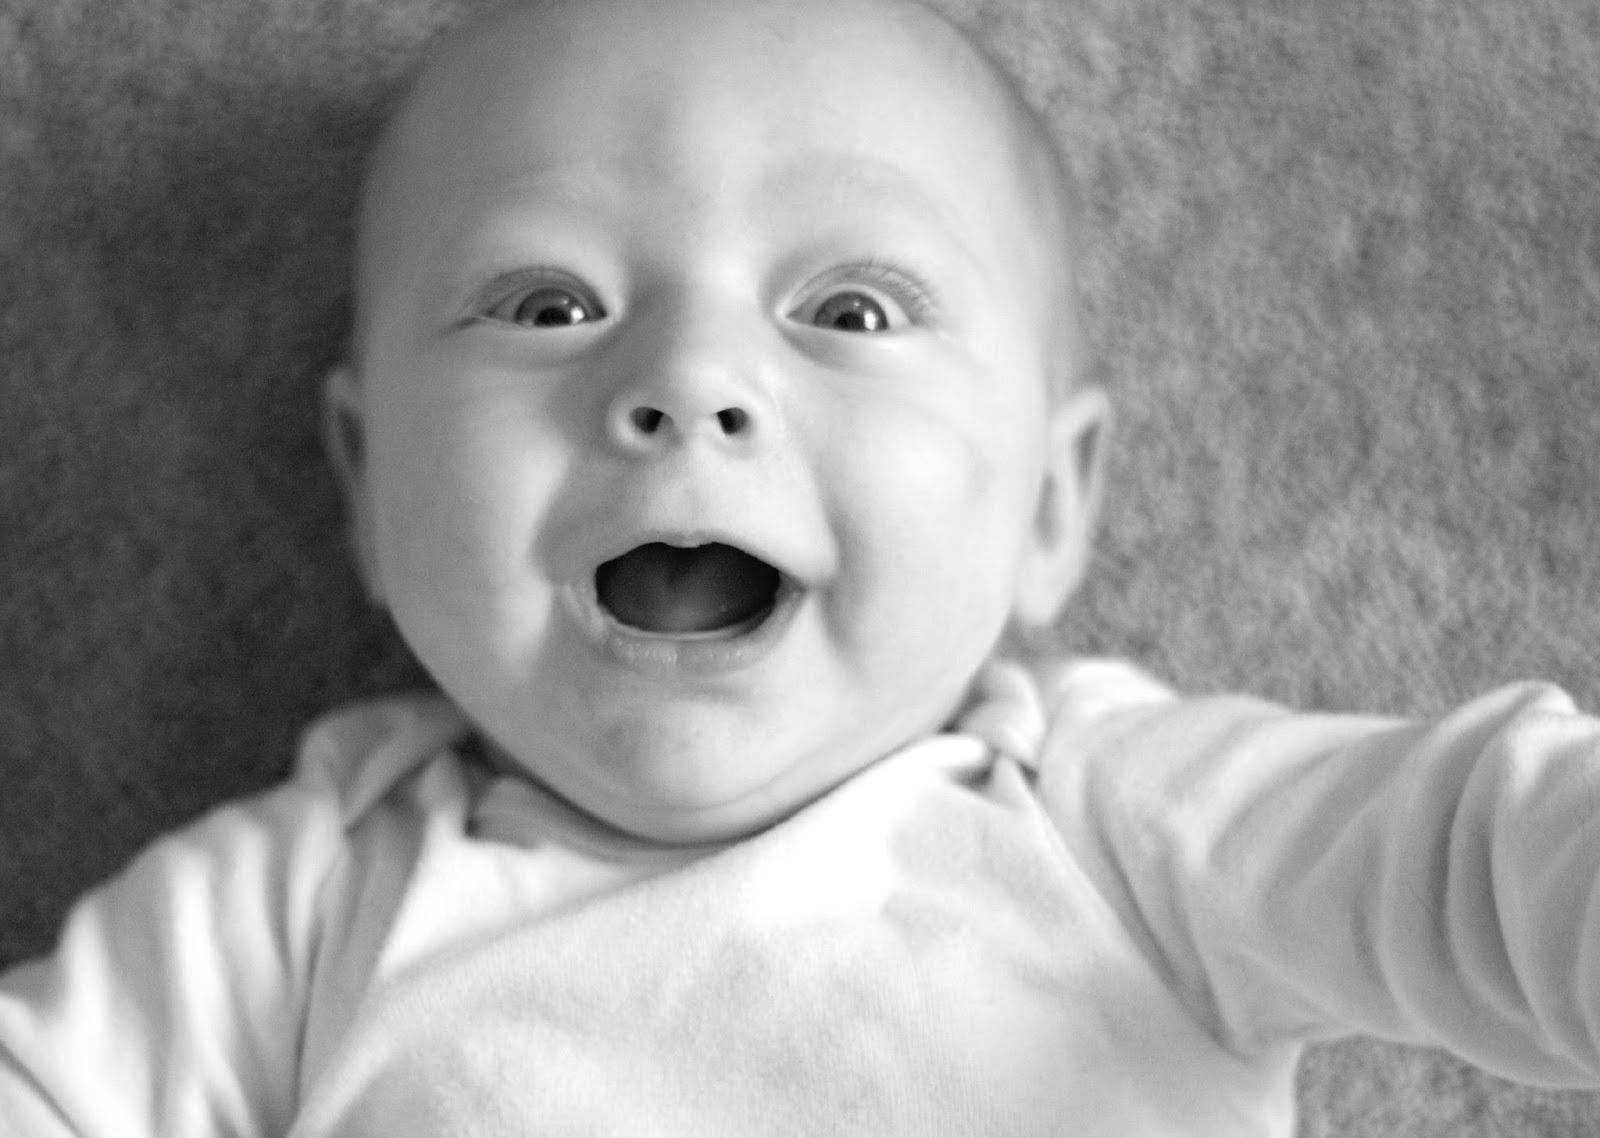 six month old boy development